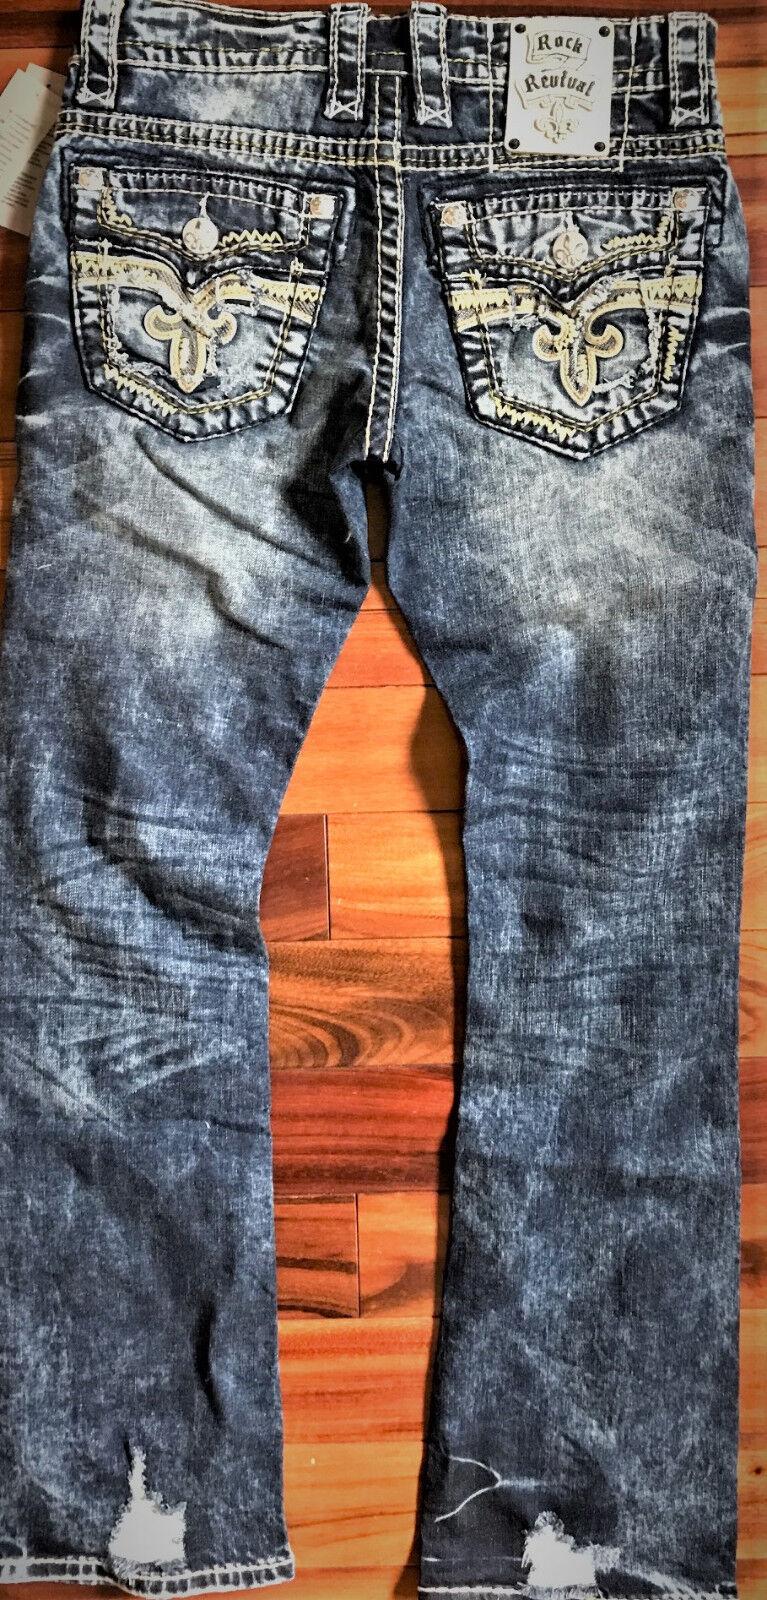 bbf36afc10f Мужские джинсы New Men s Rock Revival Scion Slim Bootcut 27 28 29 30 31 33  Regular Long